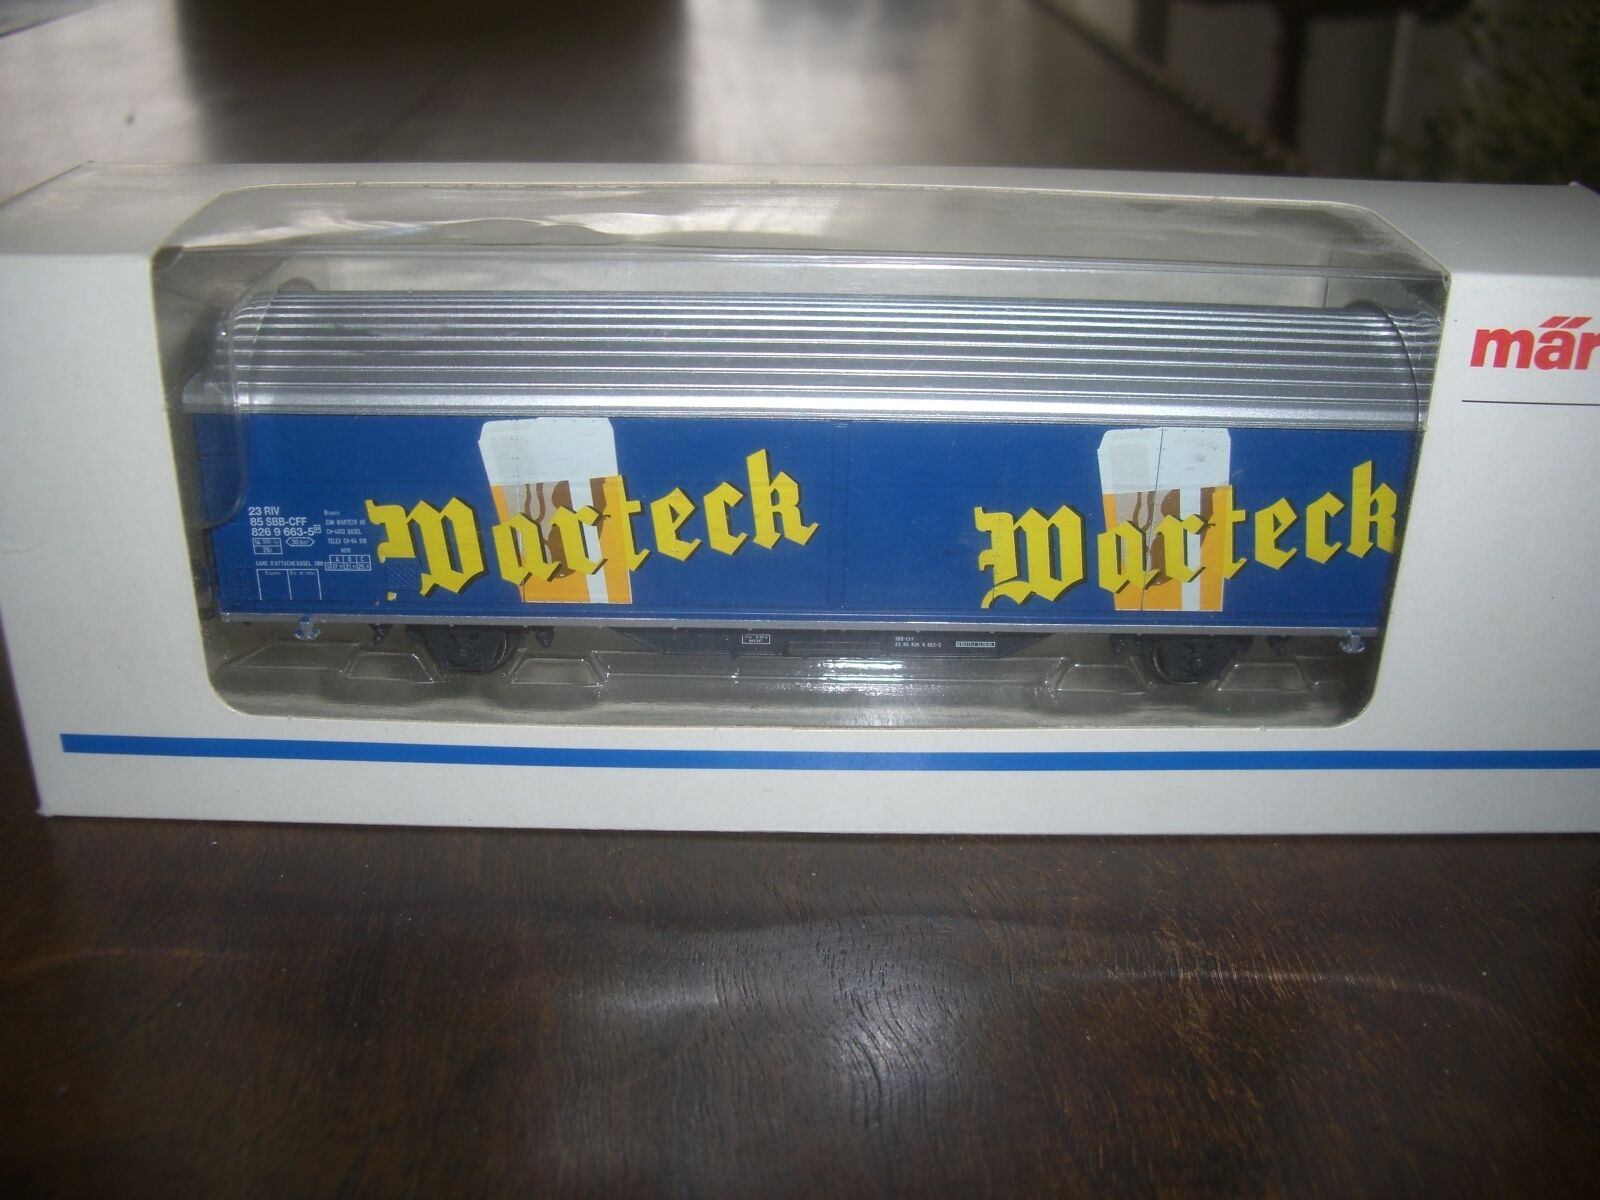 Marklin beer vagon  HO Wartech Switzerland  bier boxed